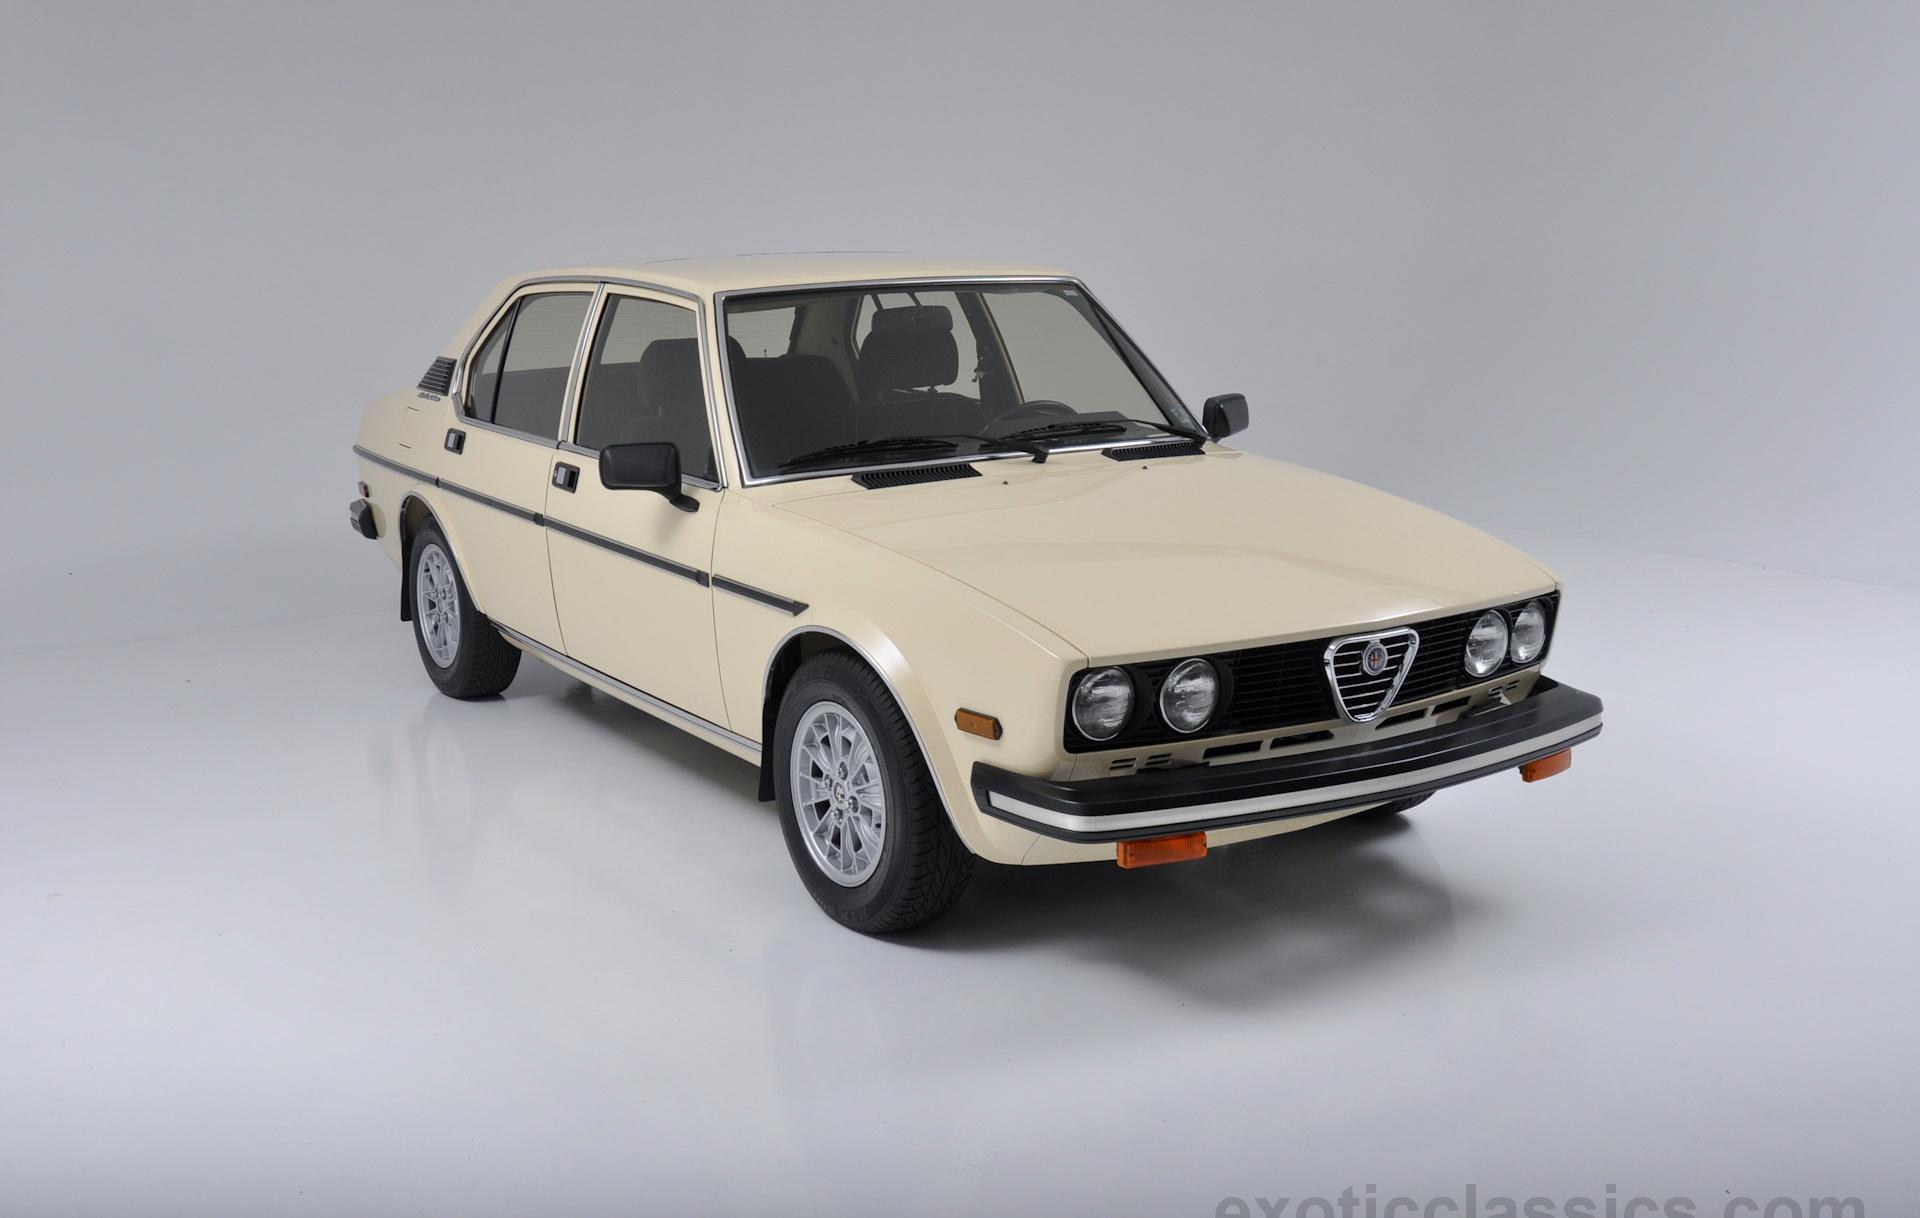 1979 alfa romeo sport sedan exotic classic car dealership new york l champion motors. Black Bedroom Furniture Sets. Home Design Ideas